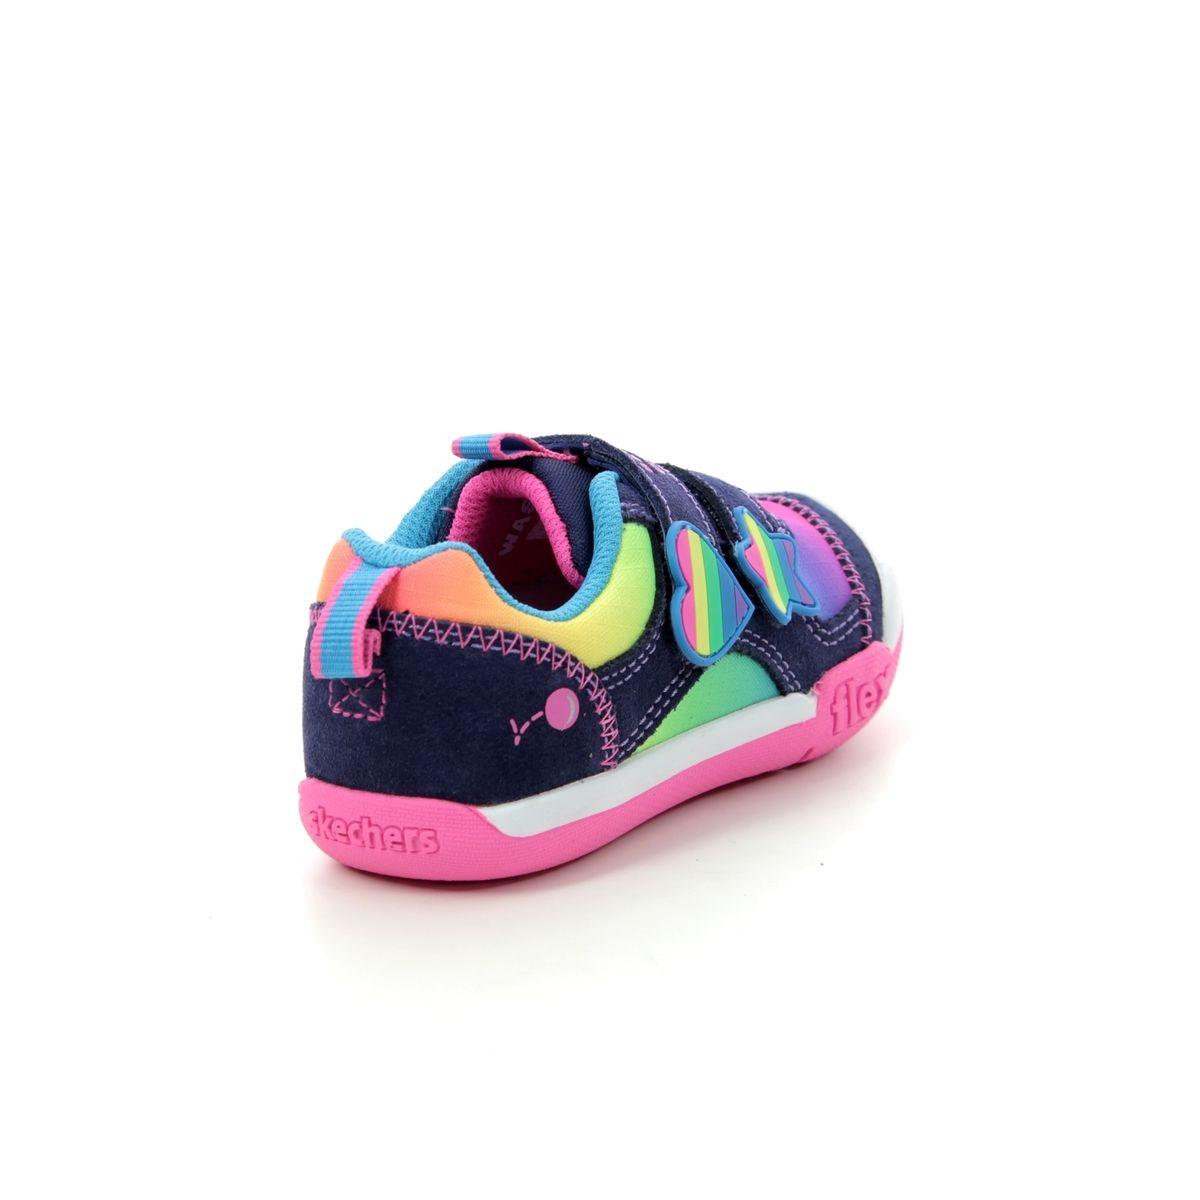 e6088f9b82c Skechers Rainbow Dash 82162 NVMT Navy multi first shoes